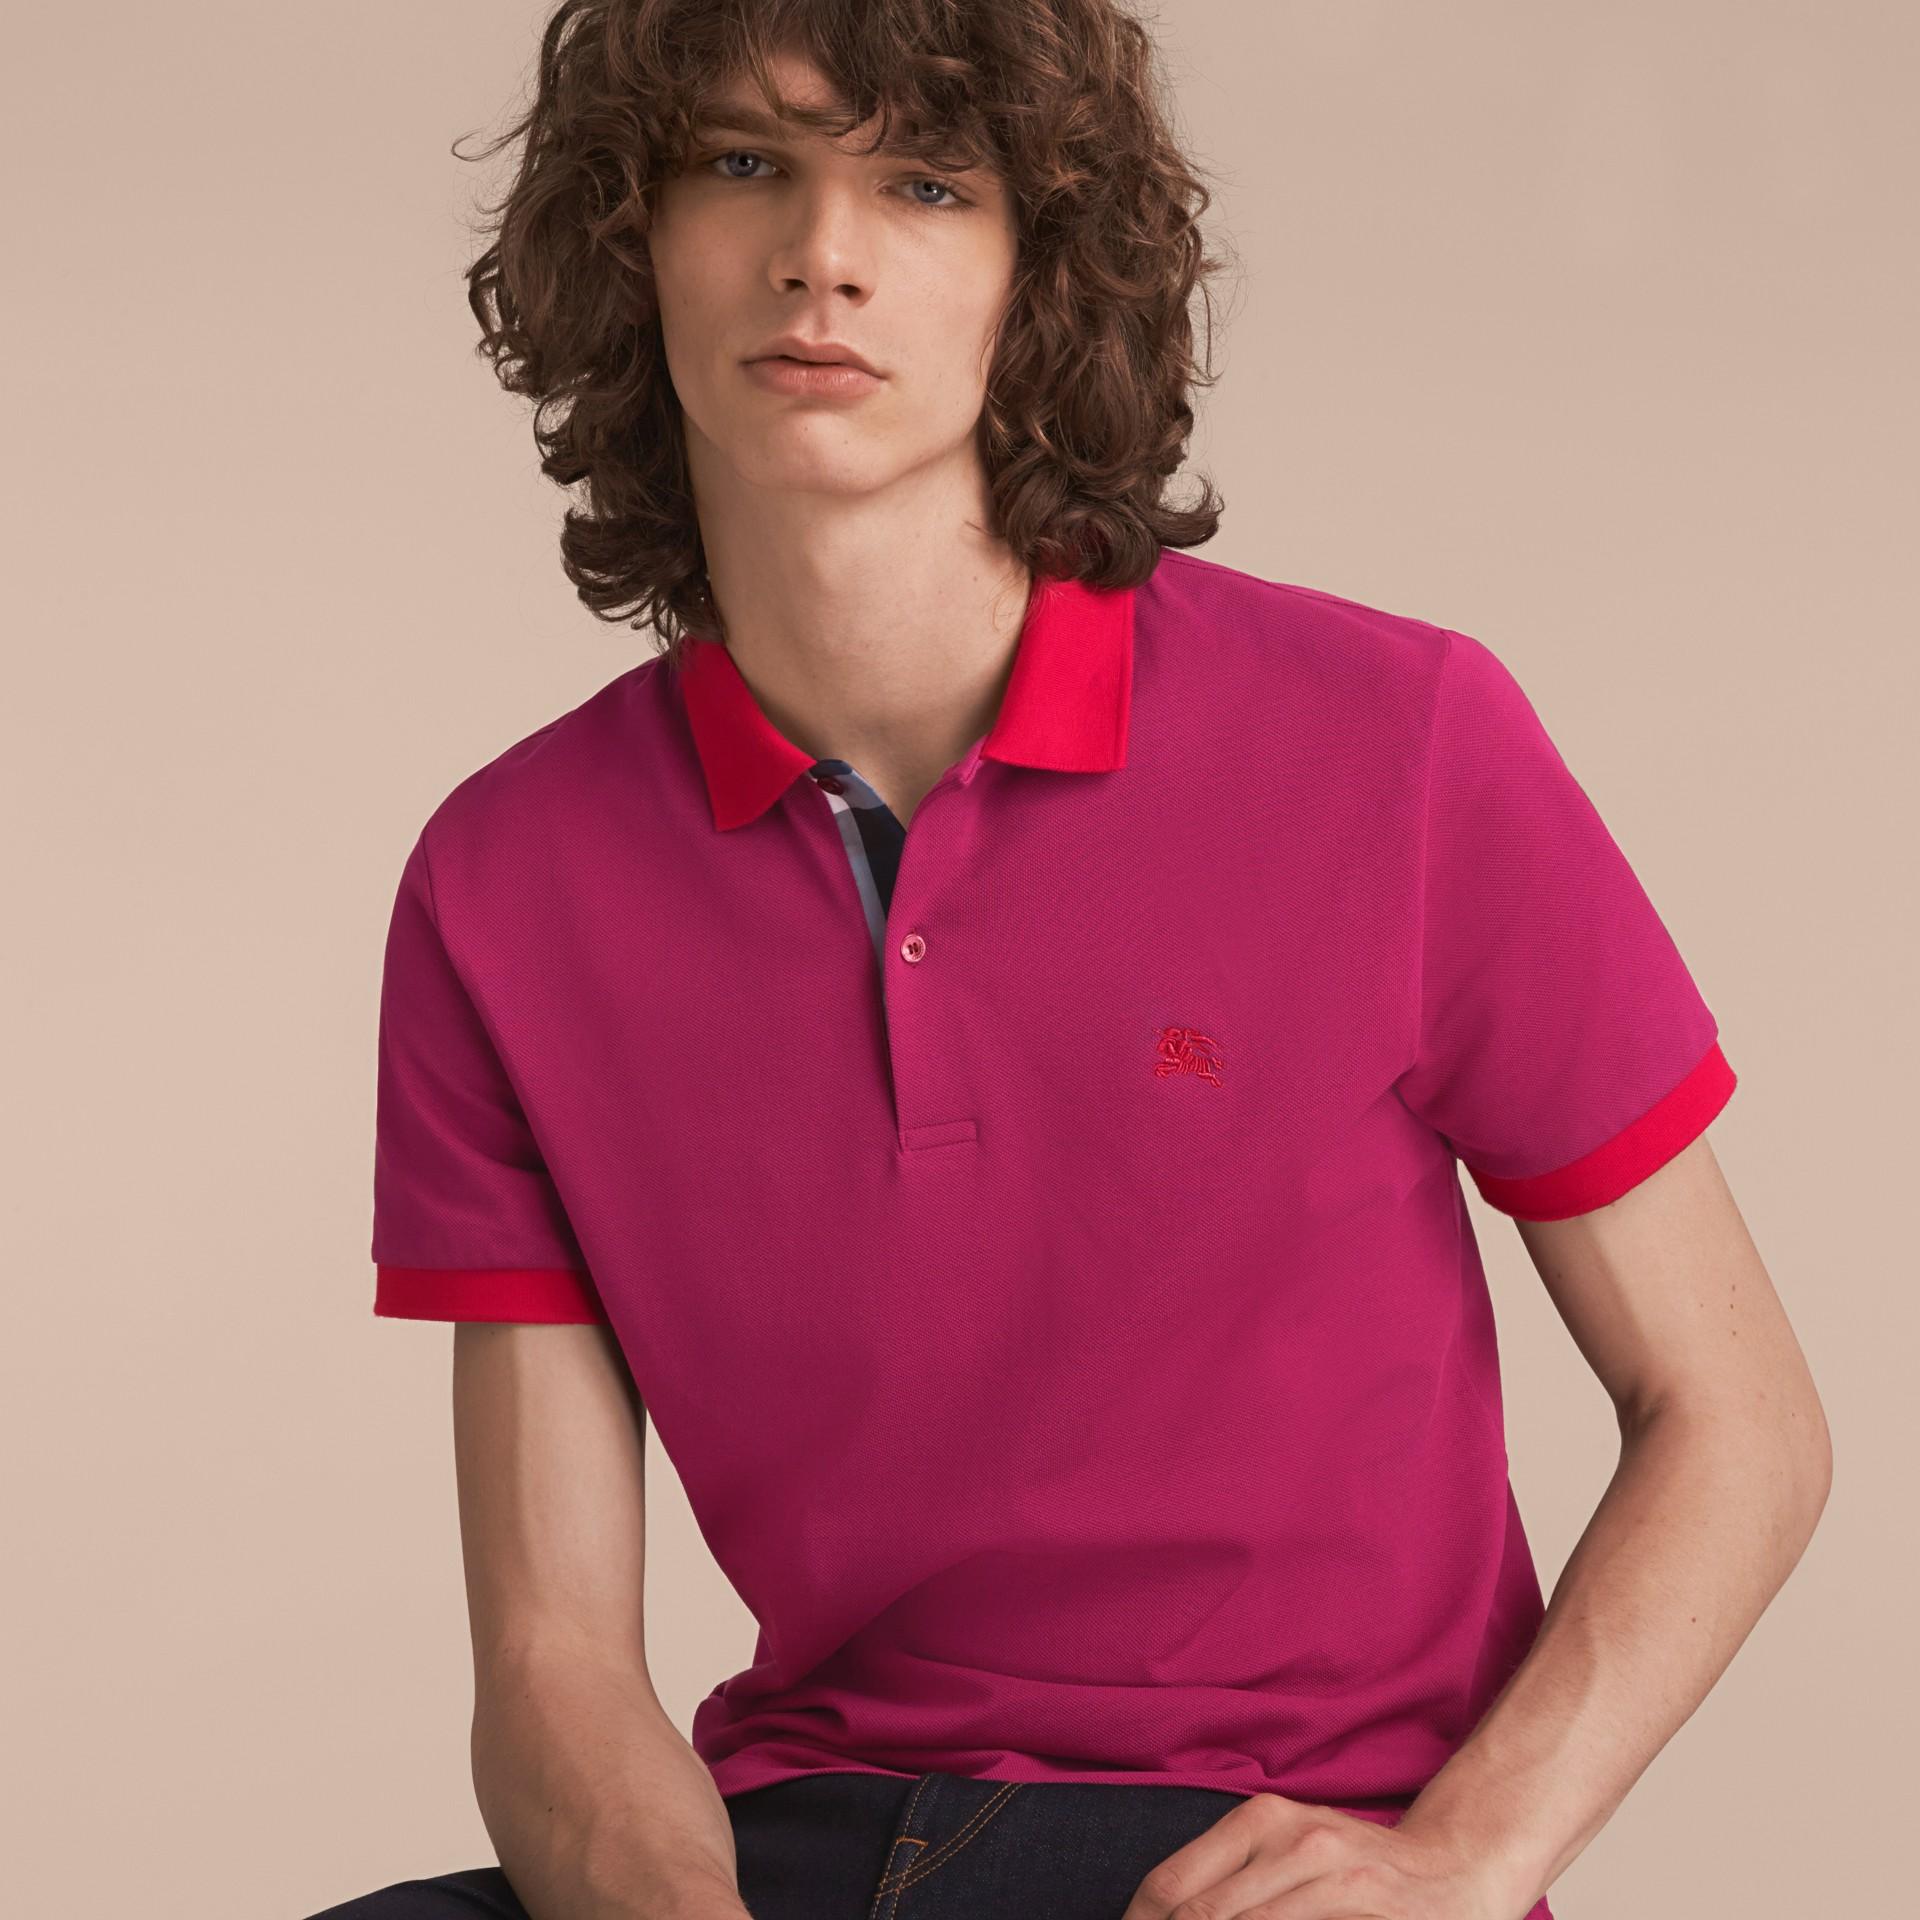 Two-tone Check Placket Cotton Piqué Polo Shirt Raspberry Sorbet - gallery image 6